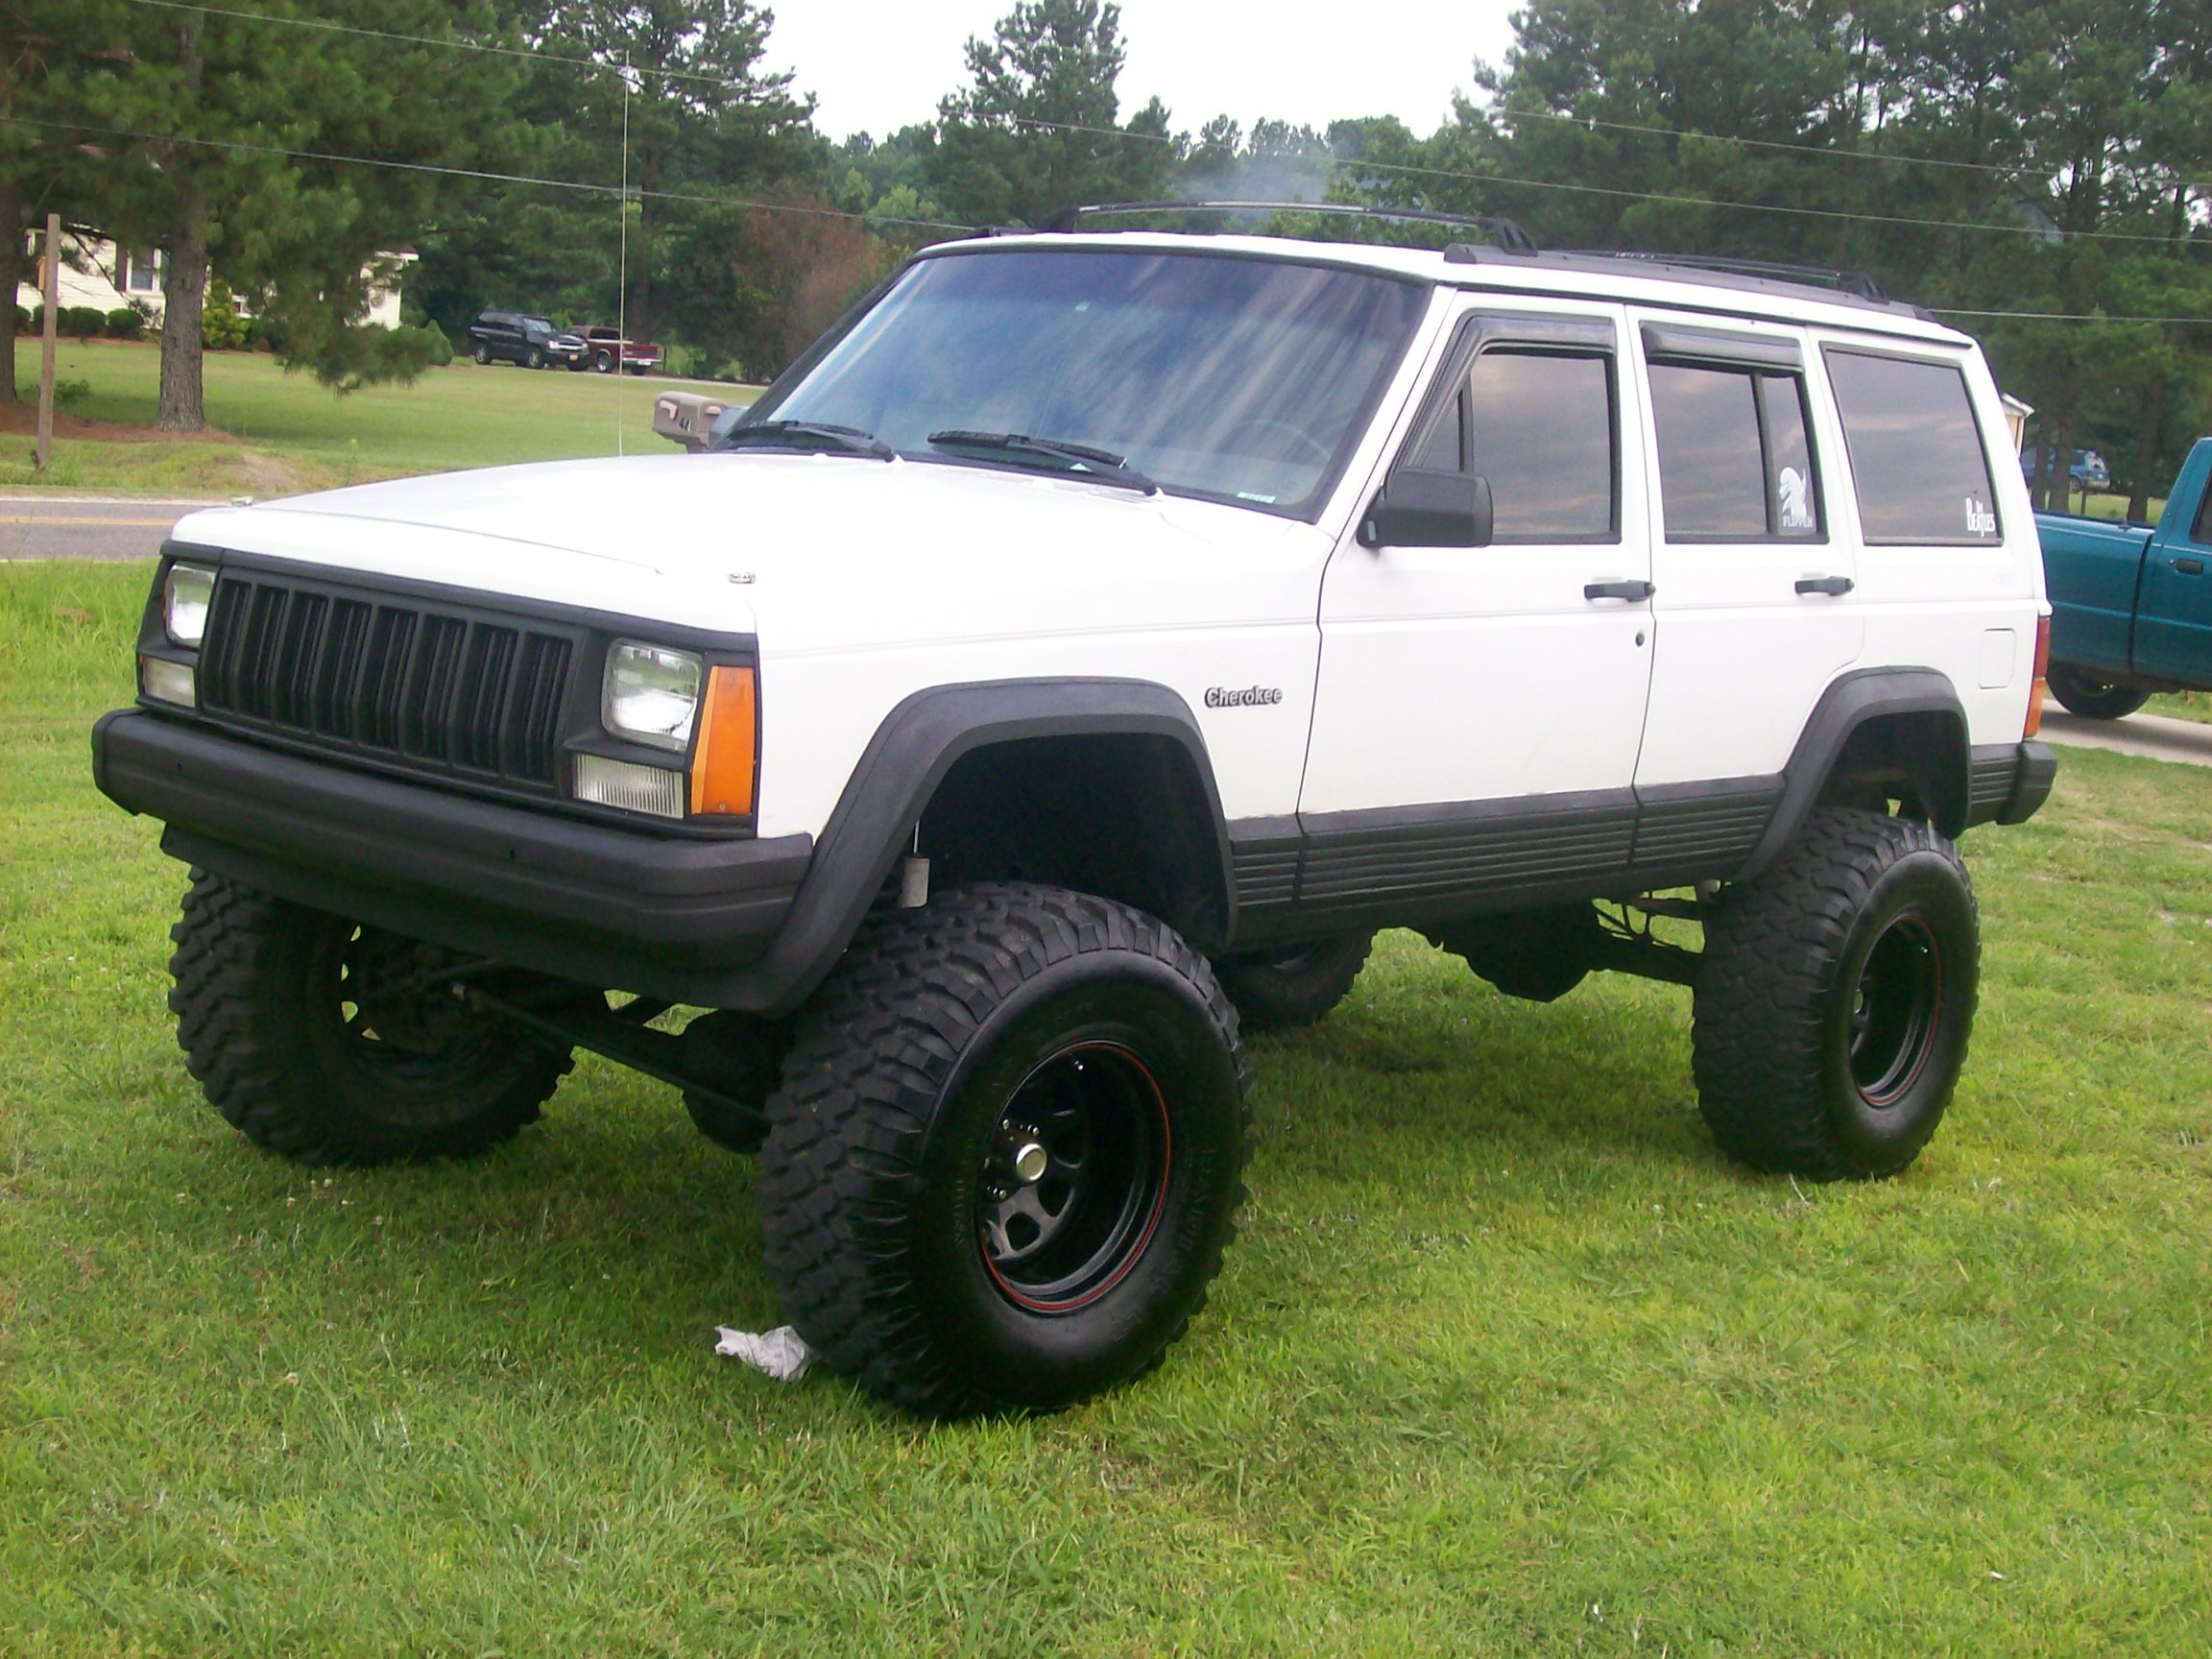 1995 Jeep Cherokee Information And Photos Zombiedrive